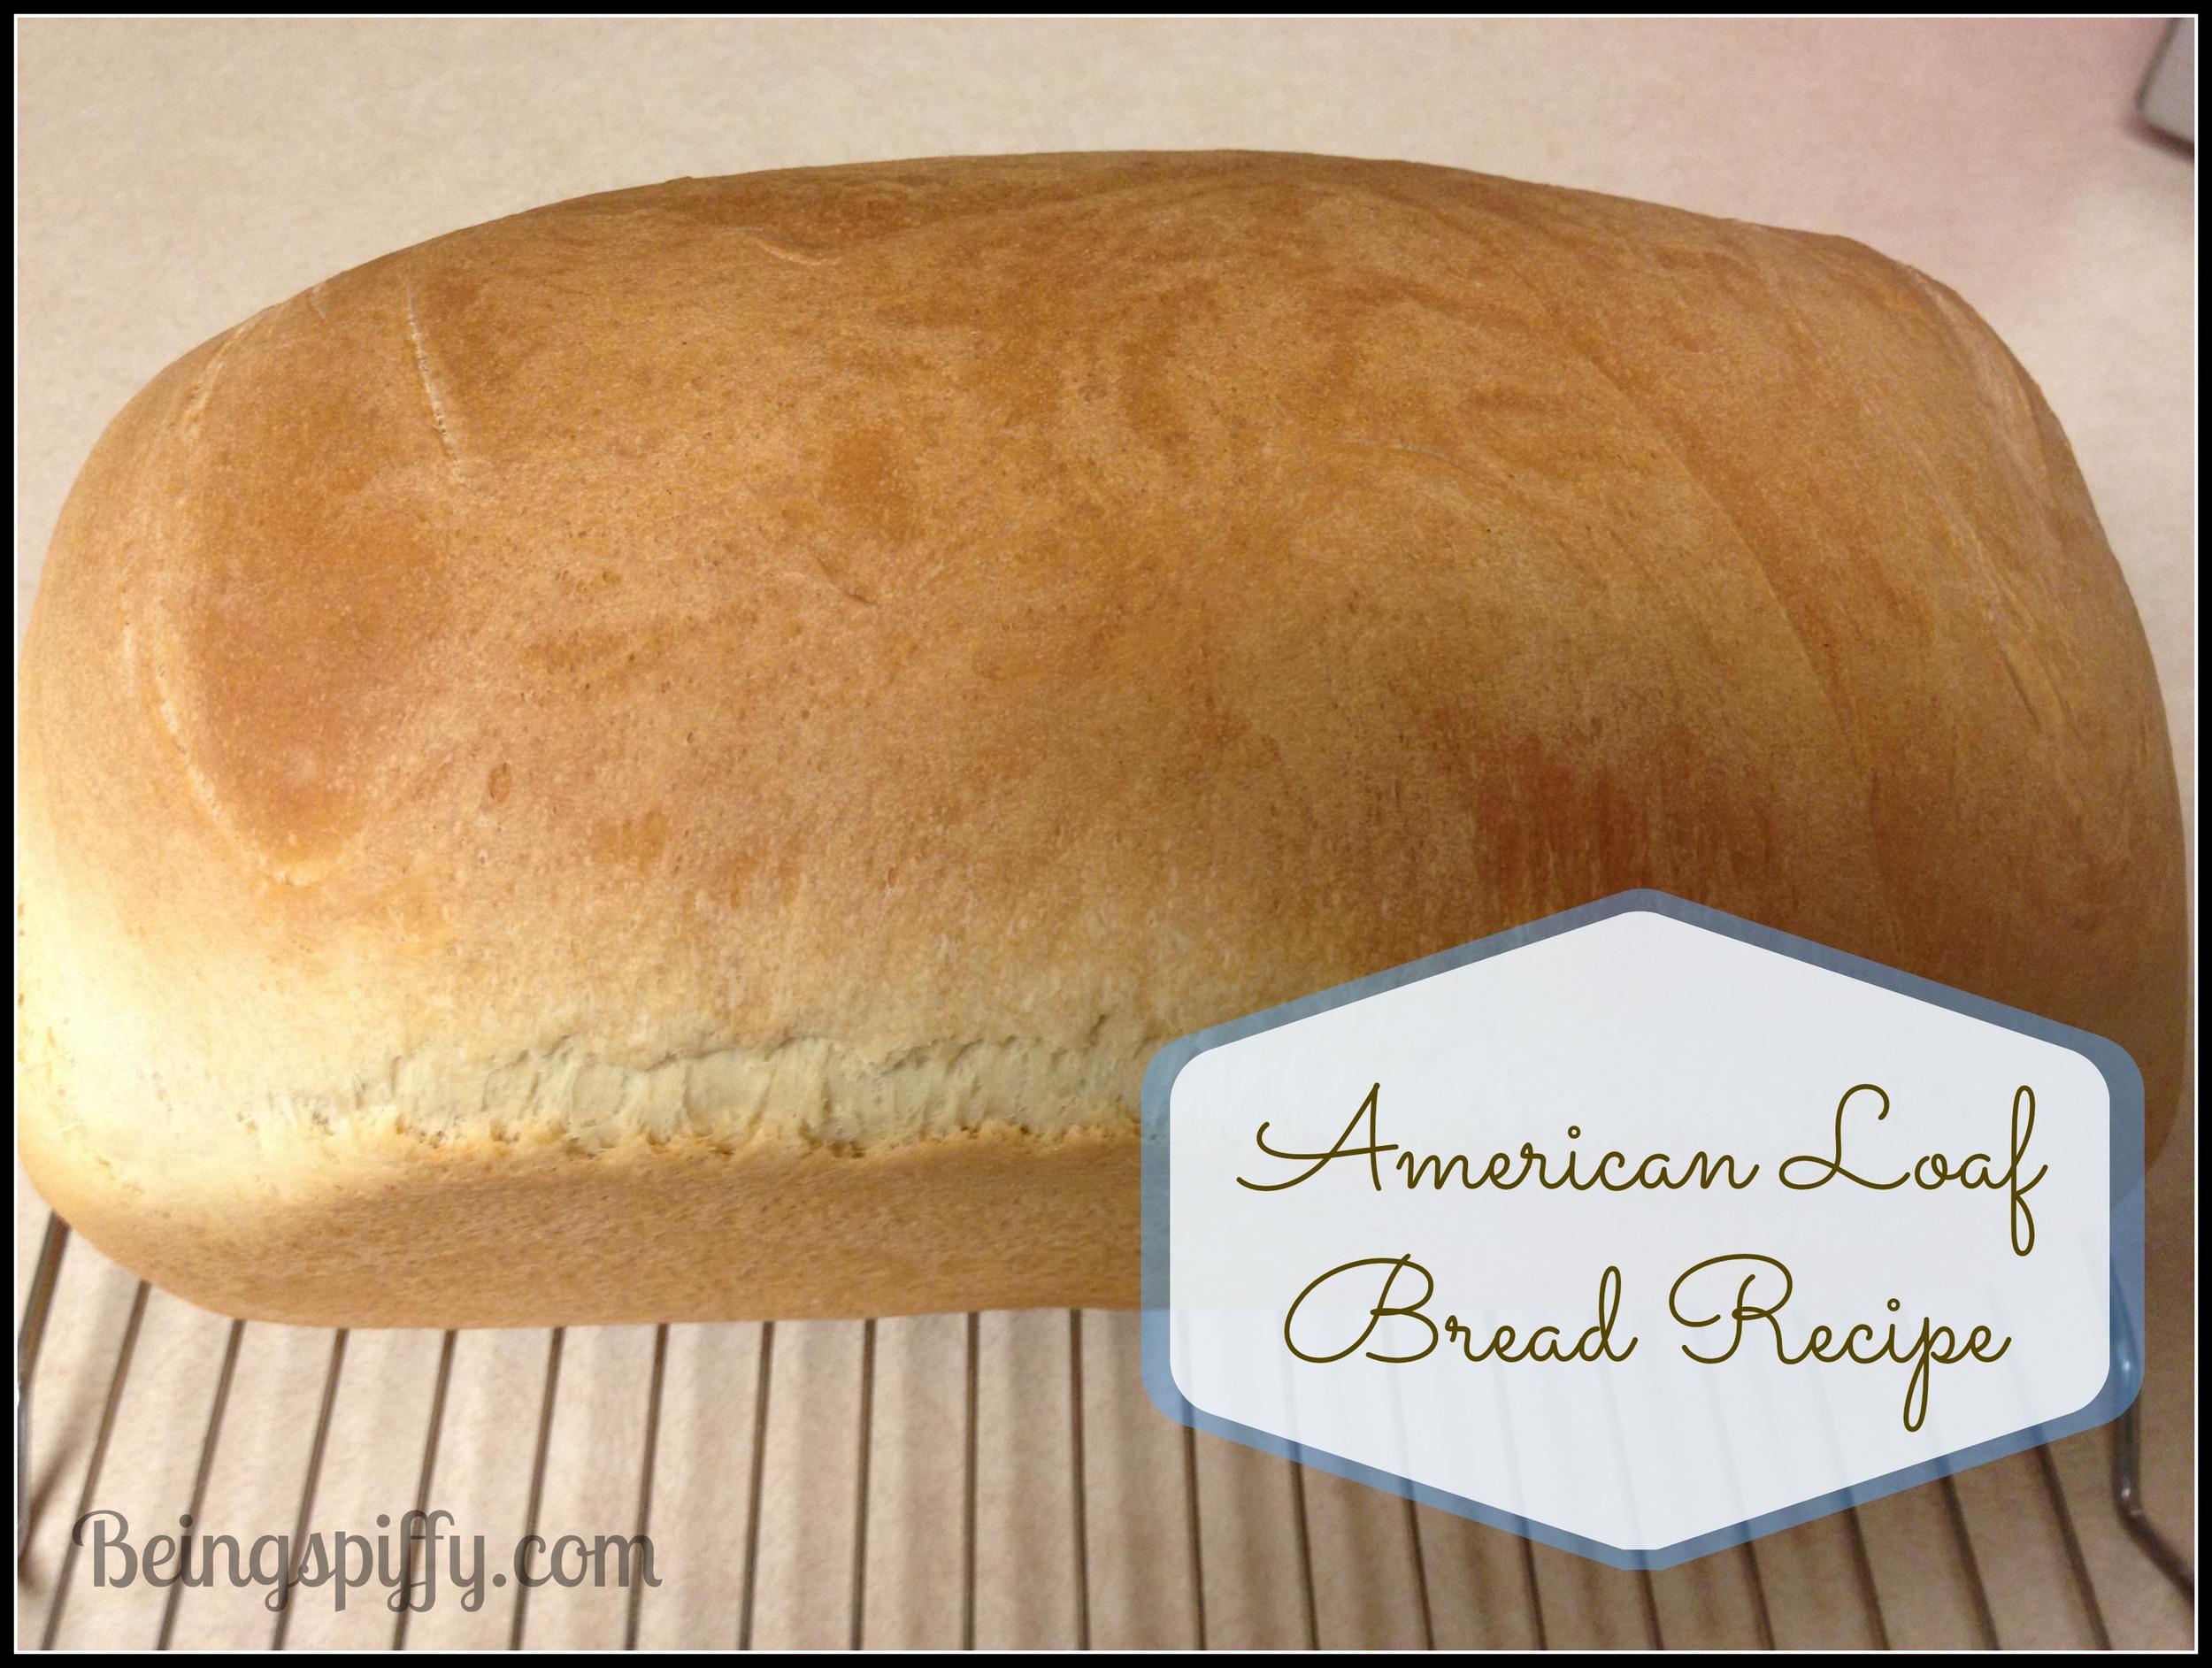 american_loaf_bread_recipe_title.jpg